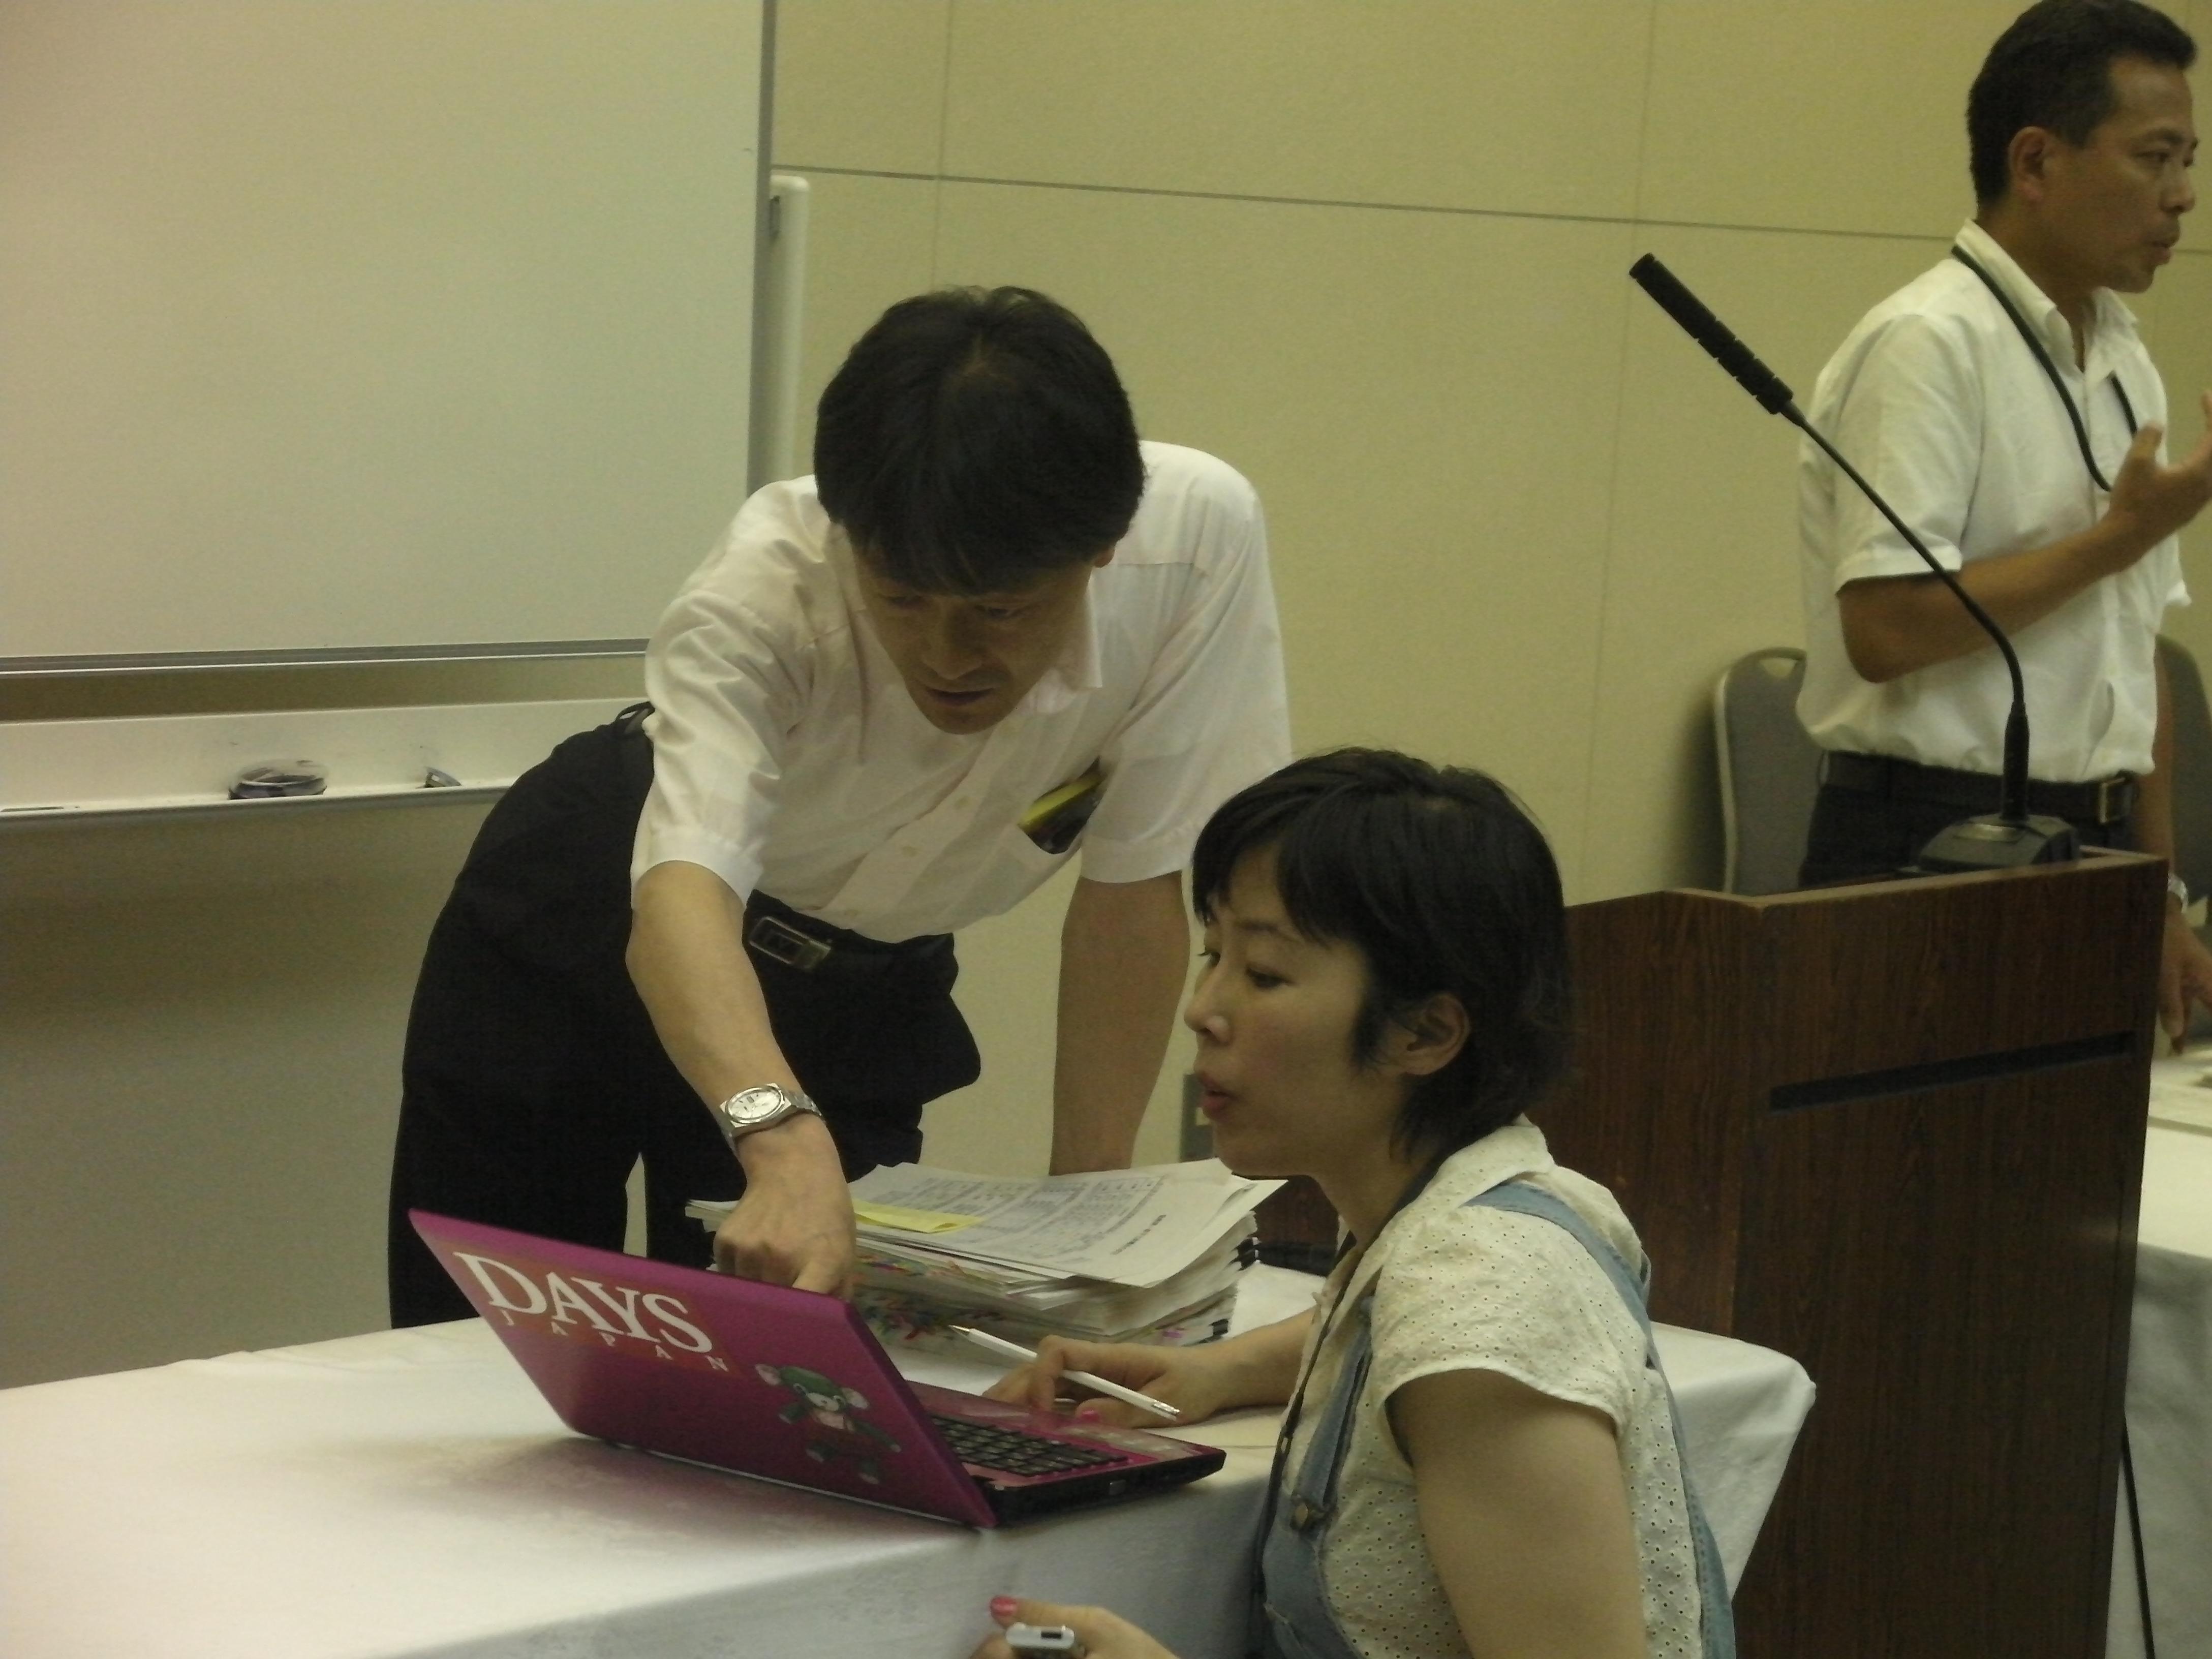 http://daily.magazine9.jp/m9/oshidori/SANY0398.JPG